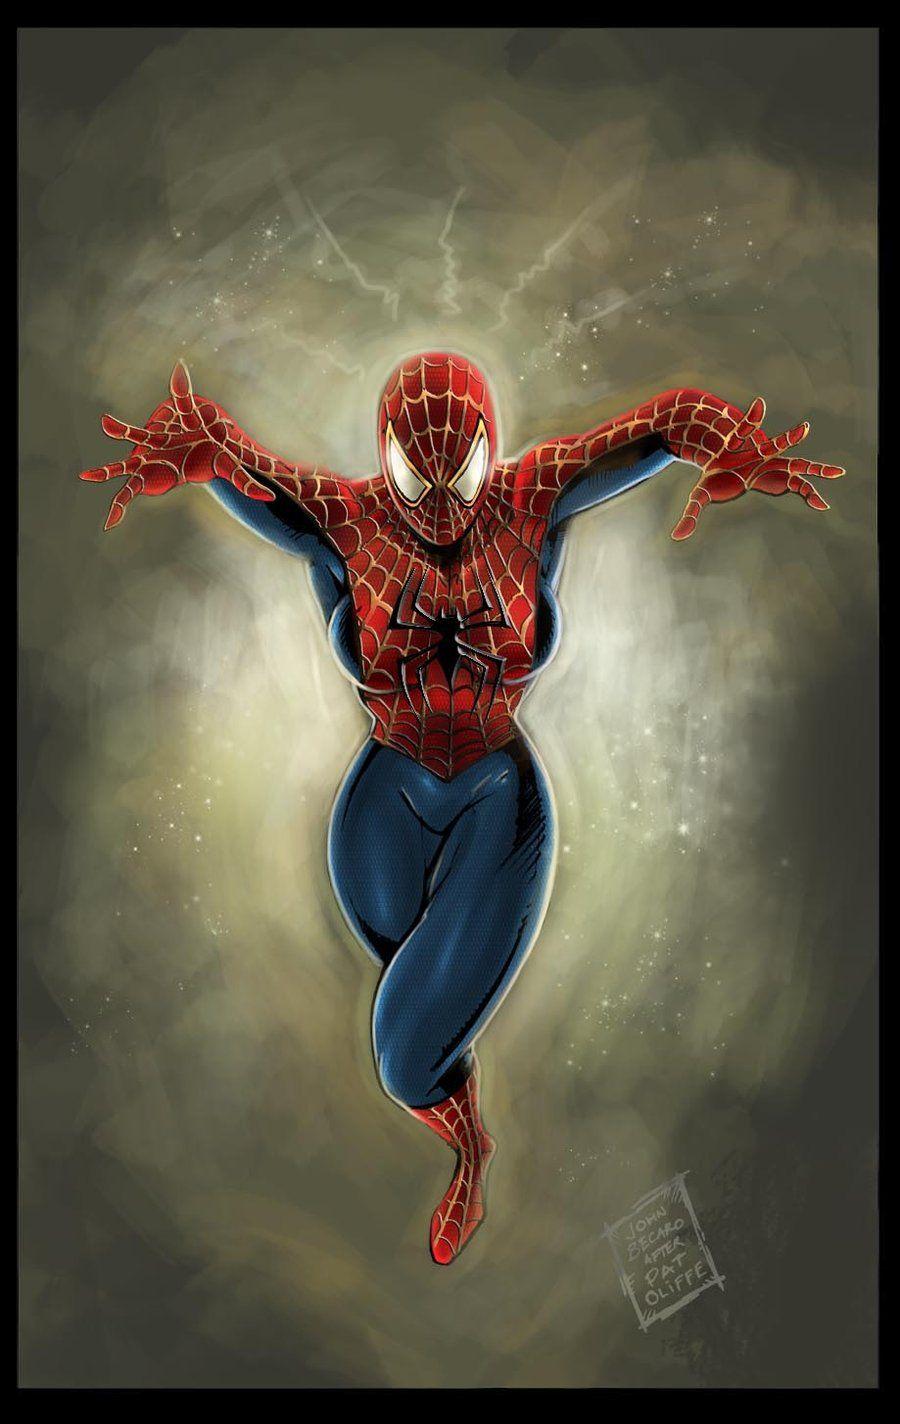 #Spider #Girl #Fan #Art. (Commission: Spider Girl #2) By: John Becaro. (THE * 5 * STÅR * ÅWARD * OF: * AW YEAH, IT'S MAJOR ÅWESOMENESS!!!™)[THANK Ü 4 PINNING!!!<·><]<©>ÅÅÅ+(OB4E)